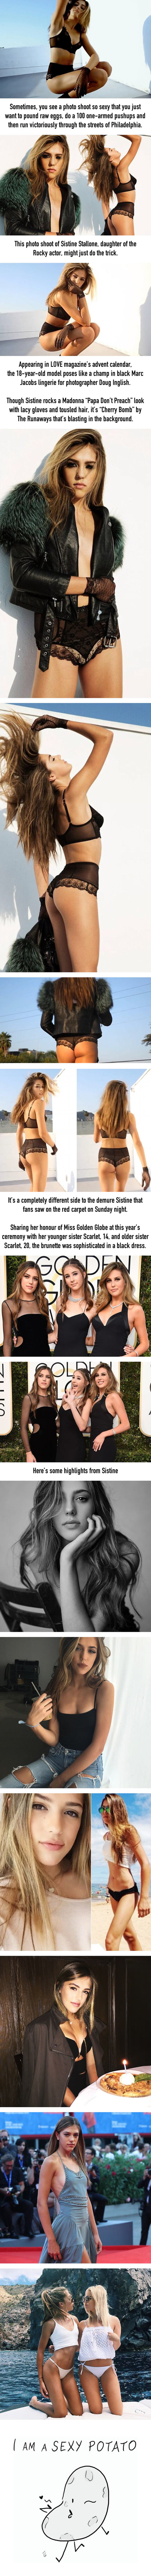 Sylvester Stallone's stunning daughter heats up latest love magazine